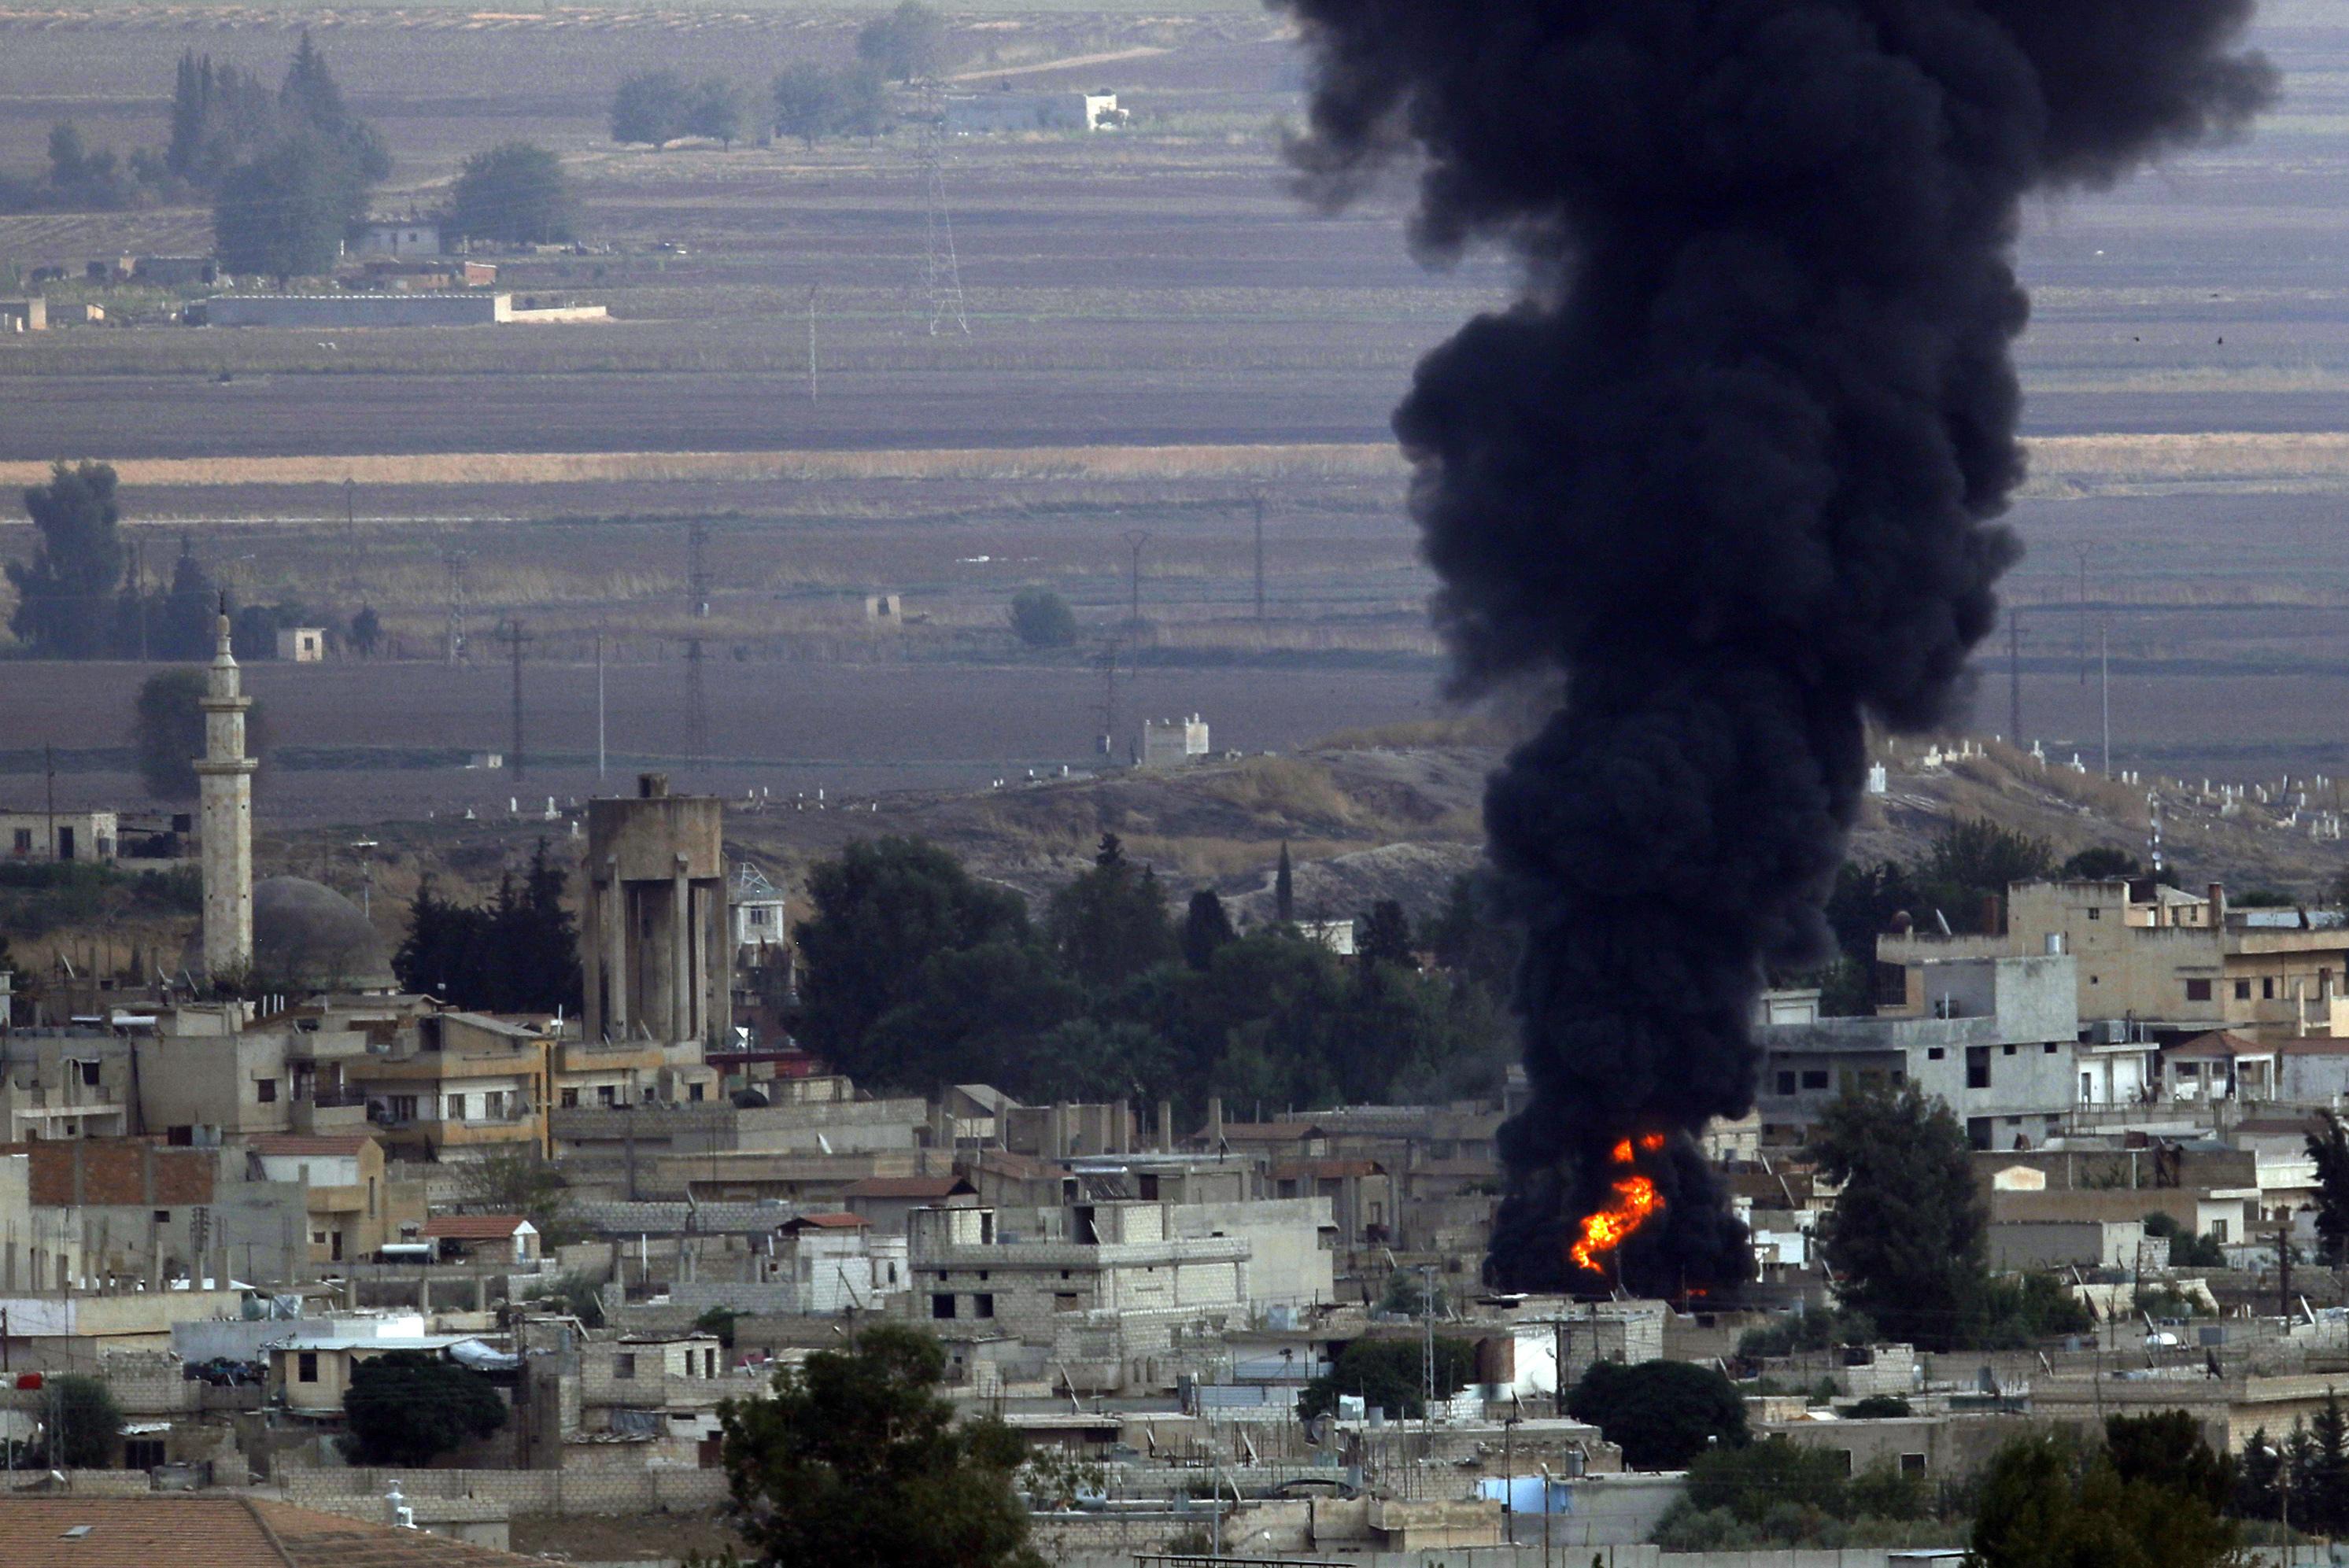 Turkey's NATO status complicates U.S. response to Erdogan's incursion in Syria